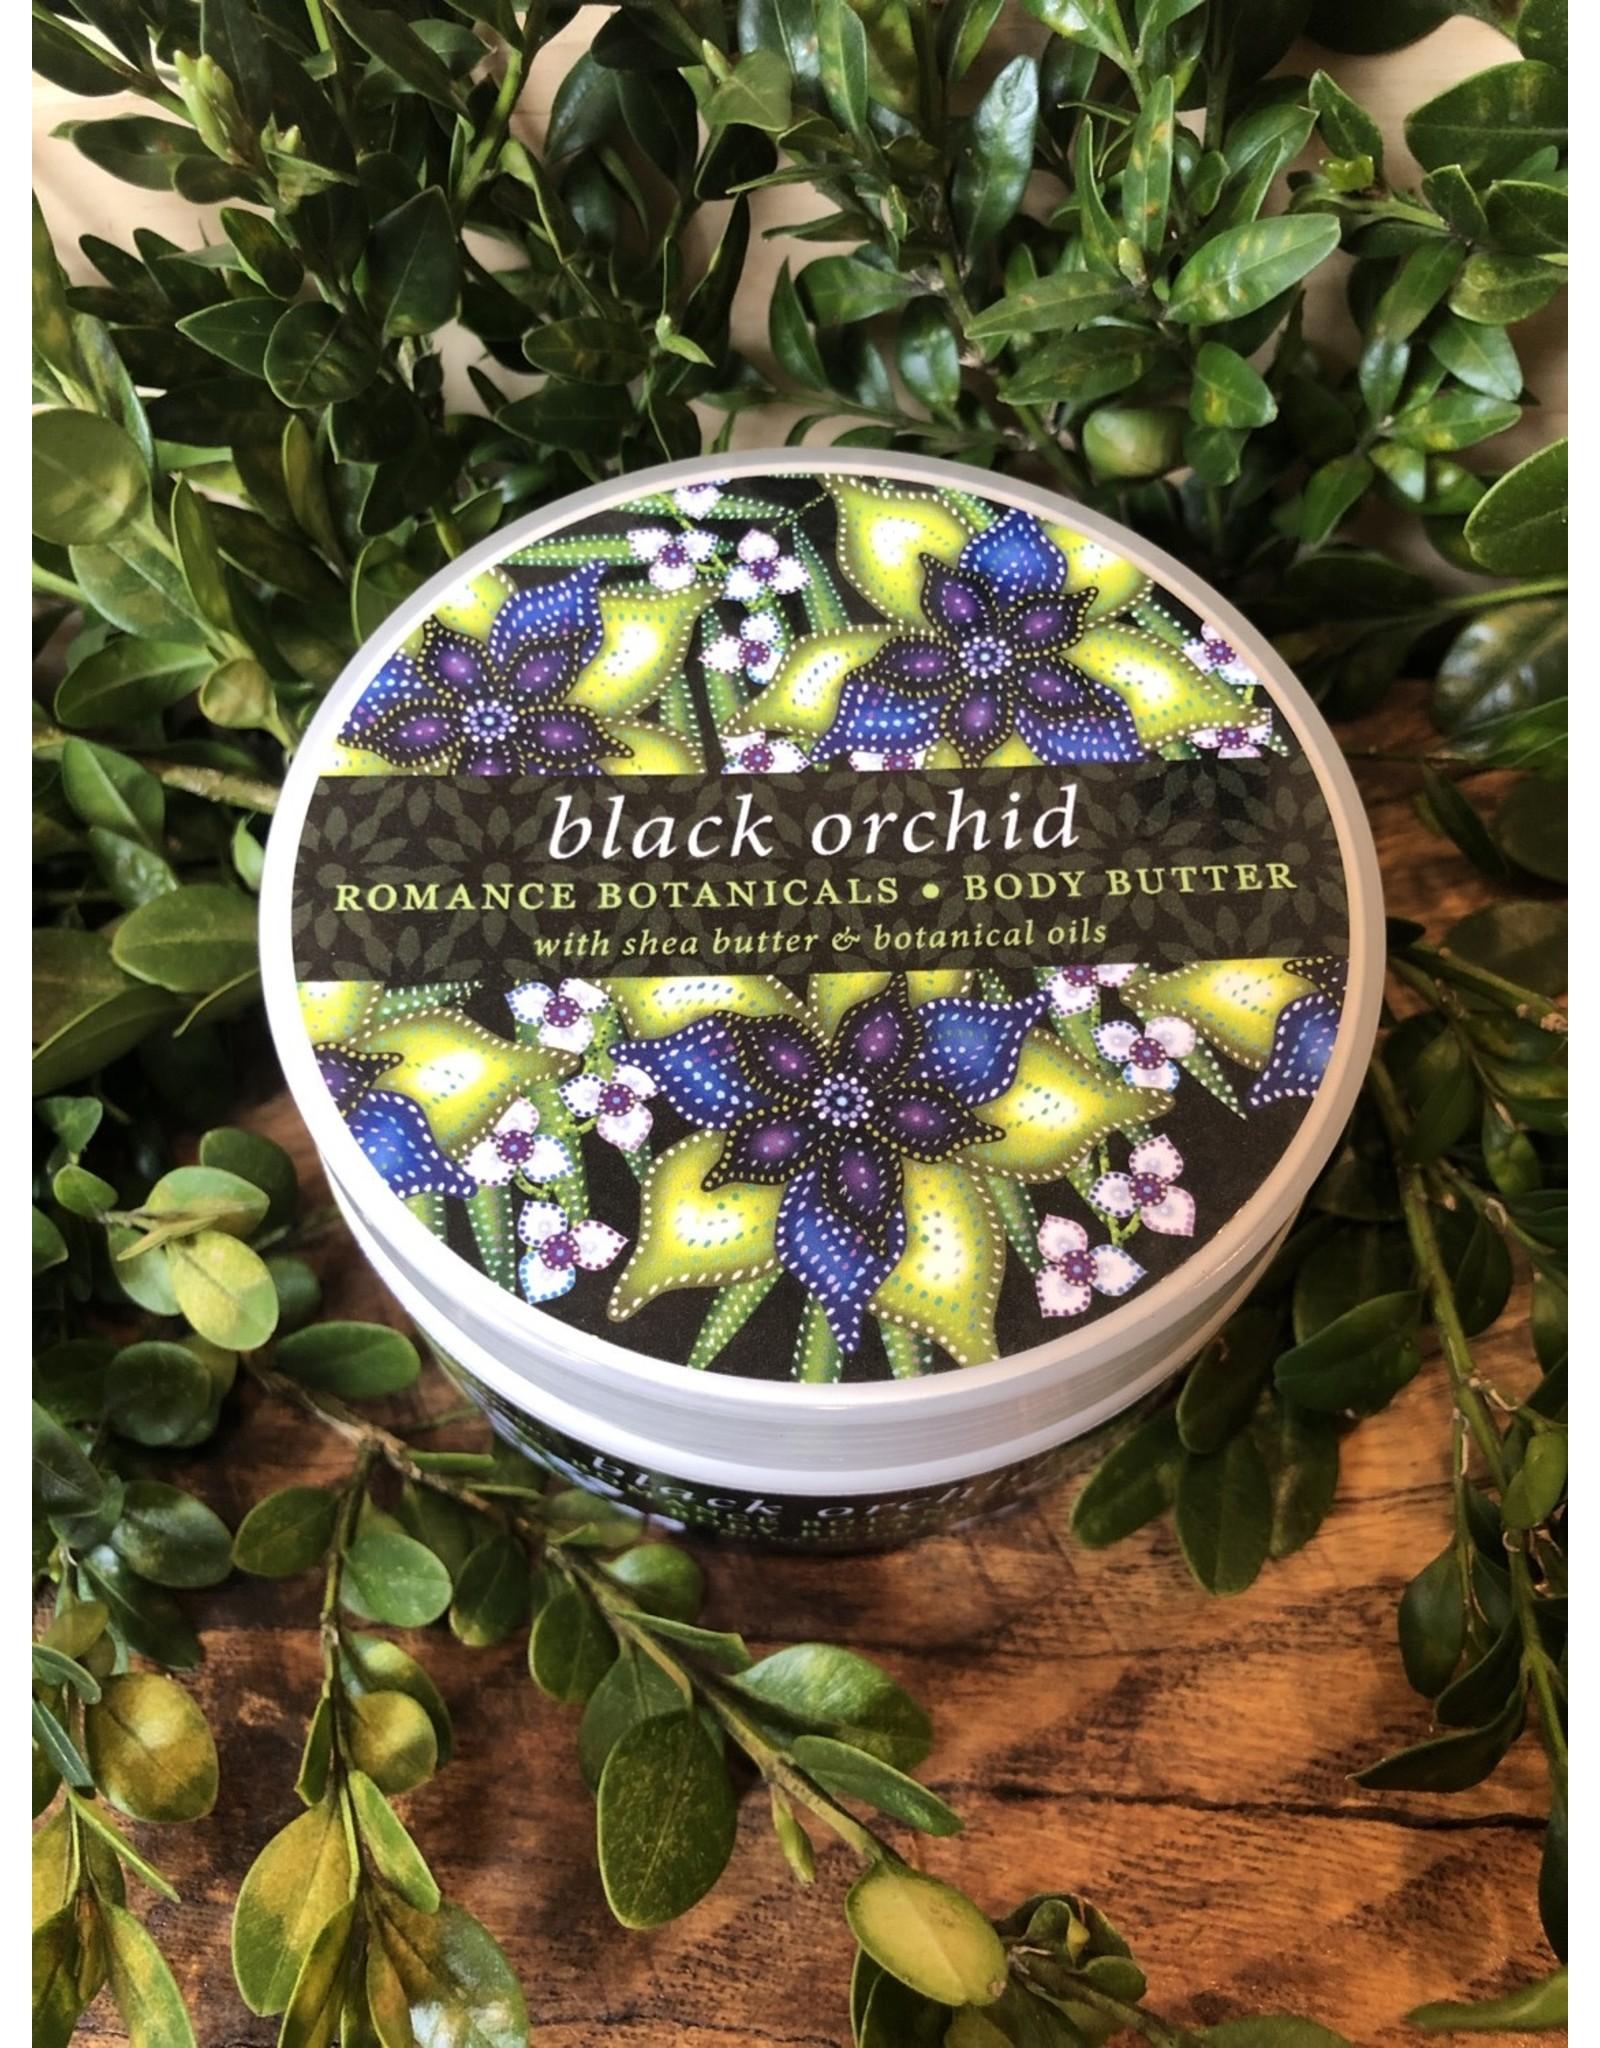 Black Orchid Botanicals